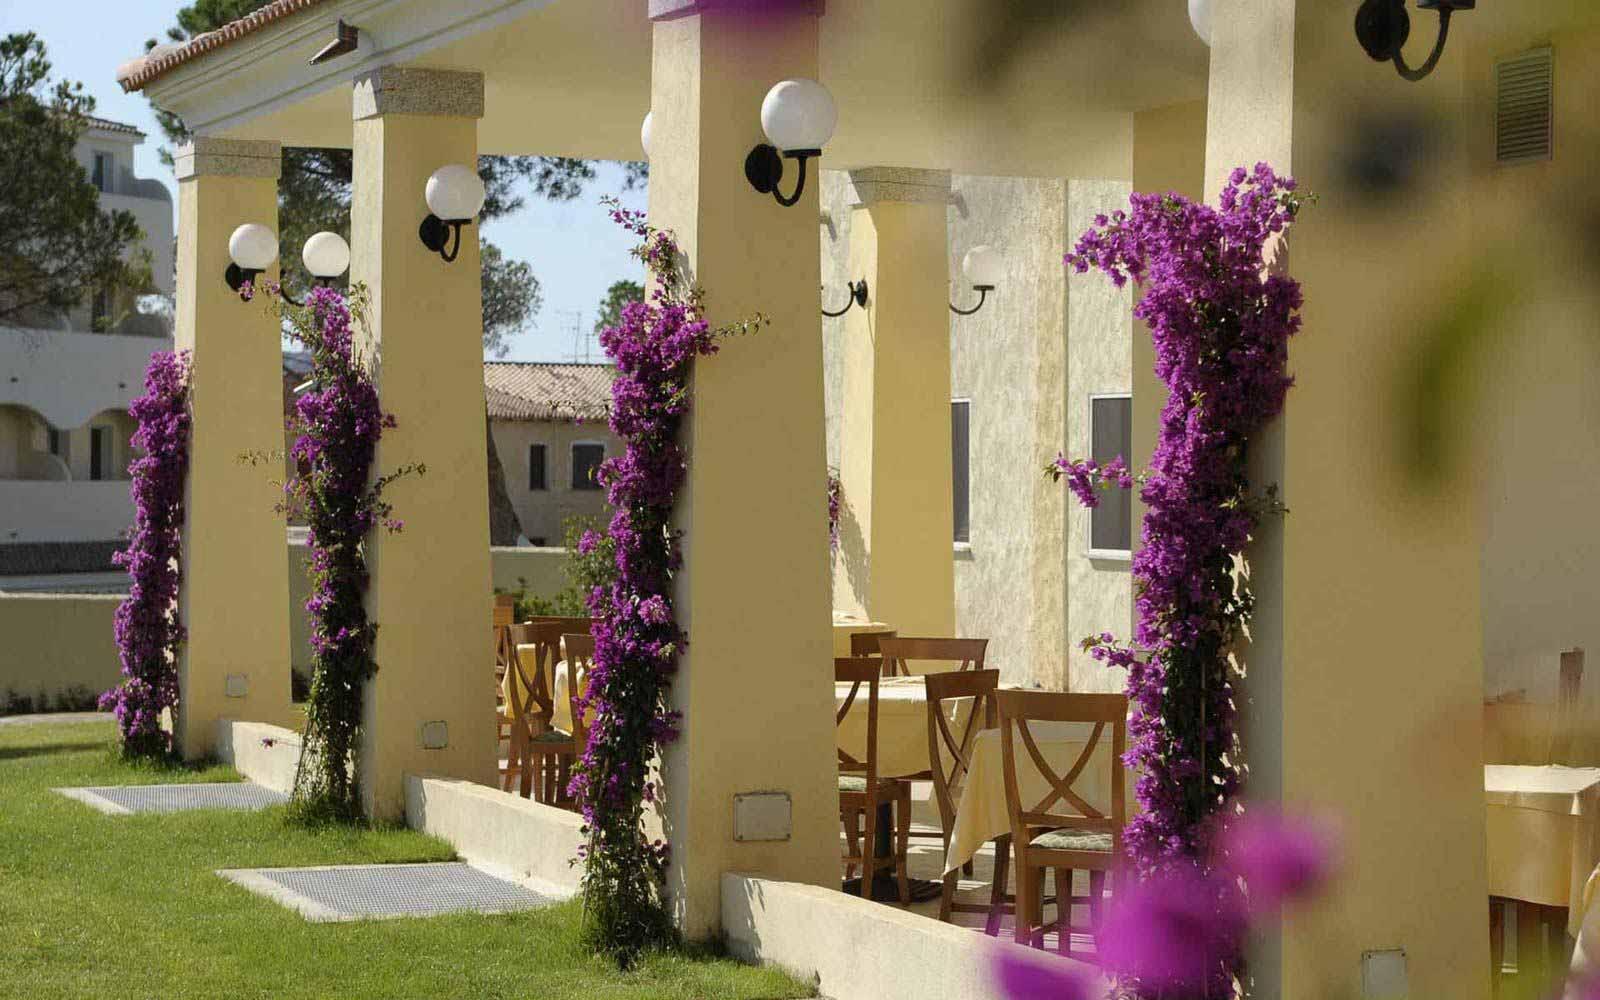 Veranda at Blu Hotel Morisco